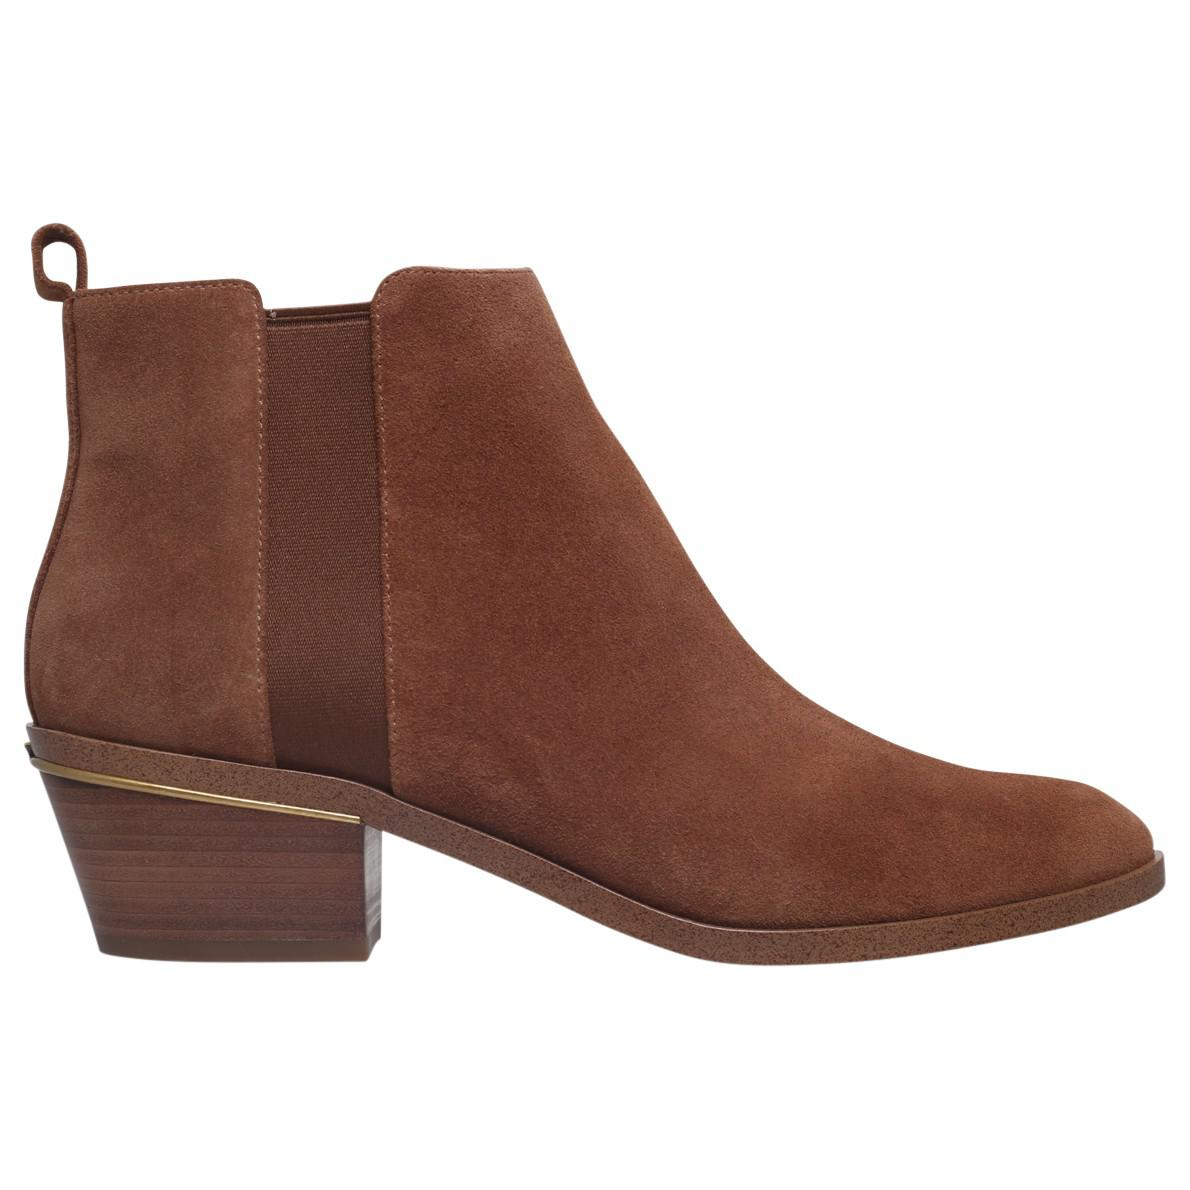 MICHAEL Michael Kors Denim Crosby Block Heeled Ankle Boots in Camel Suede (Brown)